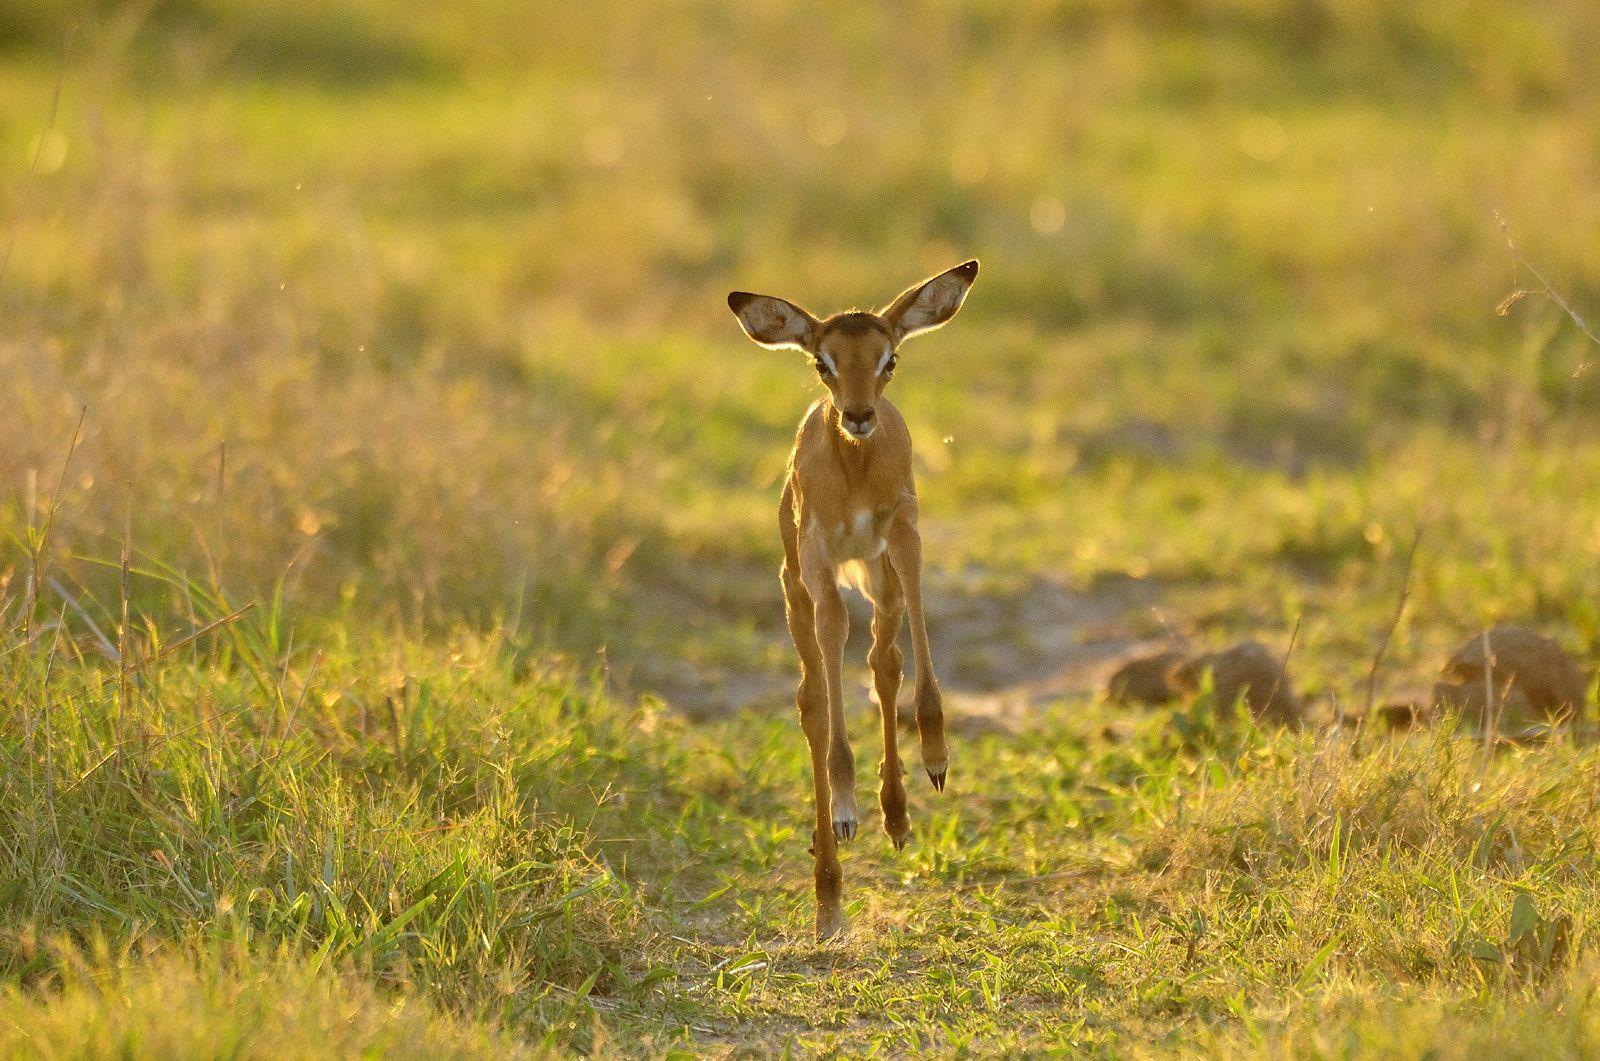 A Baby Reedbuck Frolicking In The Grasslands In Africa Animals Kidsonsafari